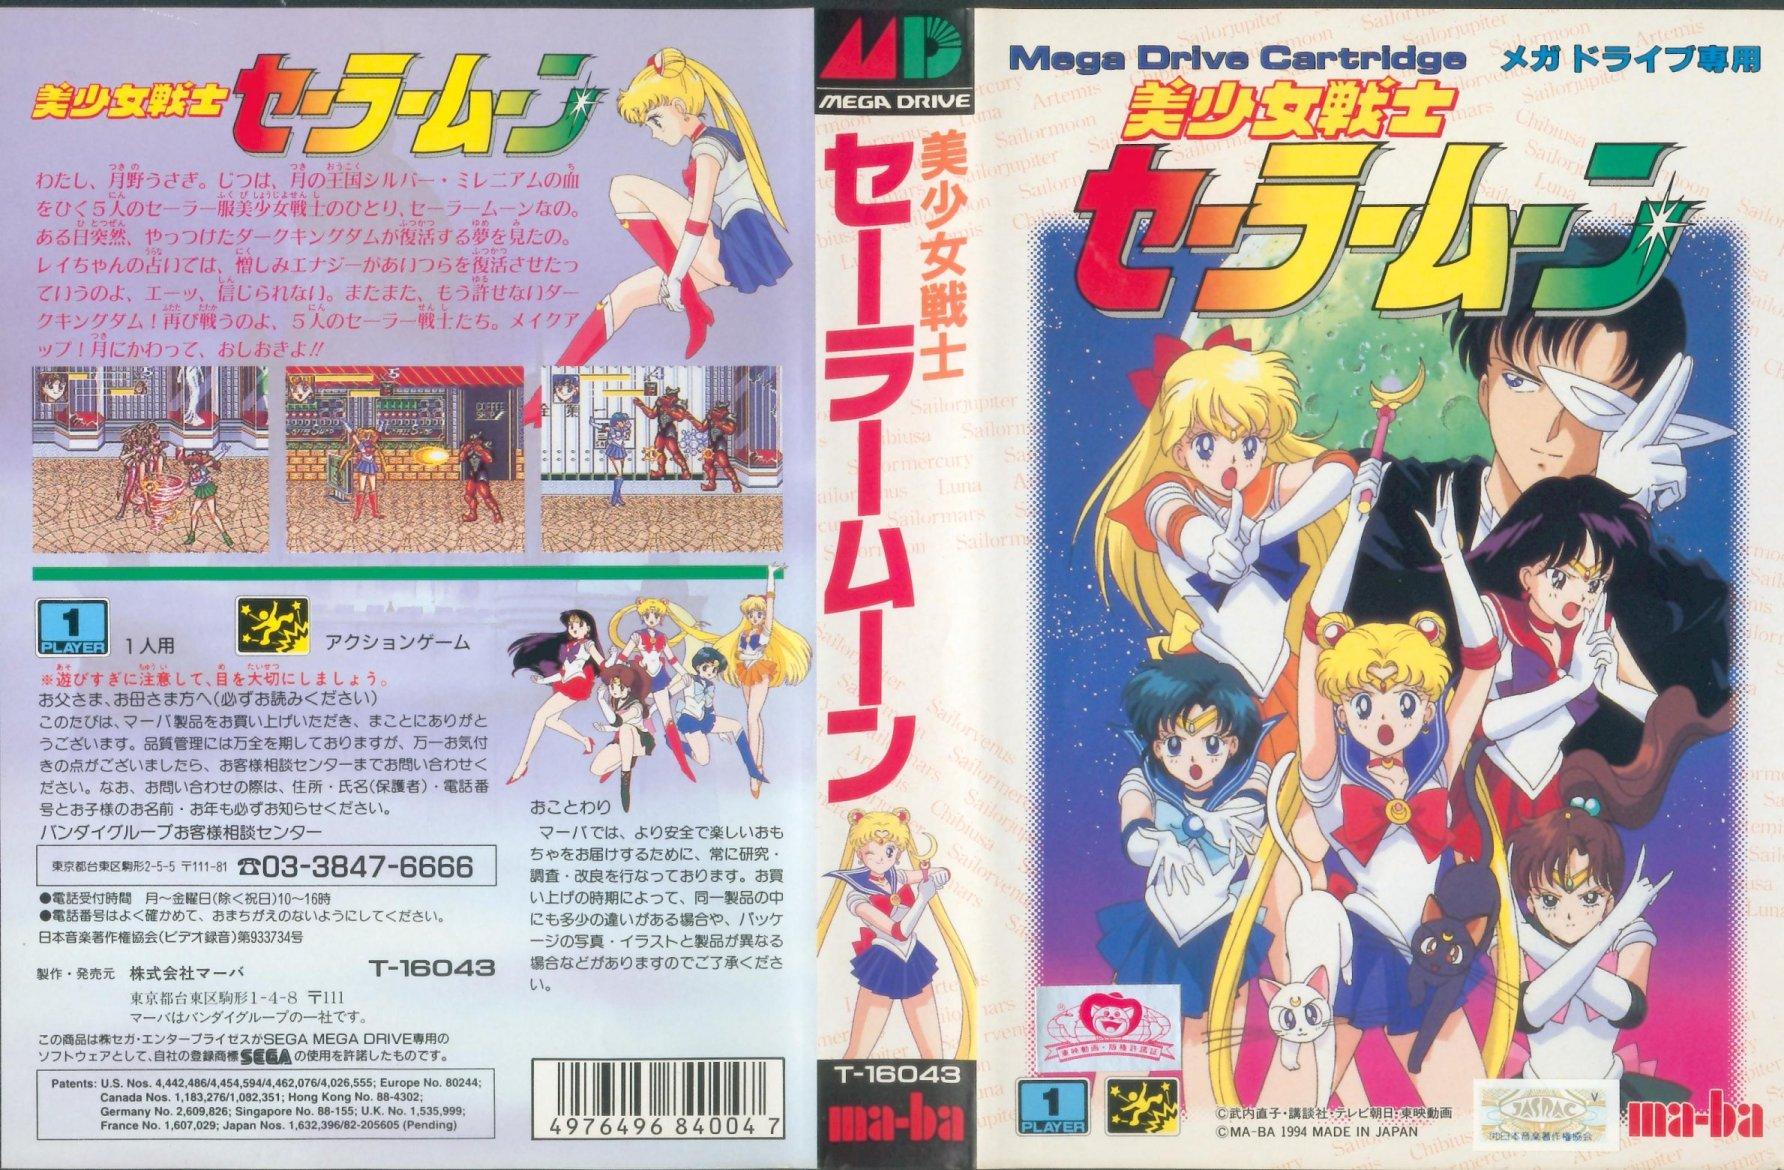 Bishoujo Senshi Sailor Moon (Mega Drive)